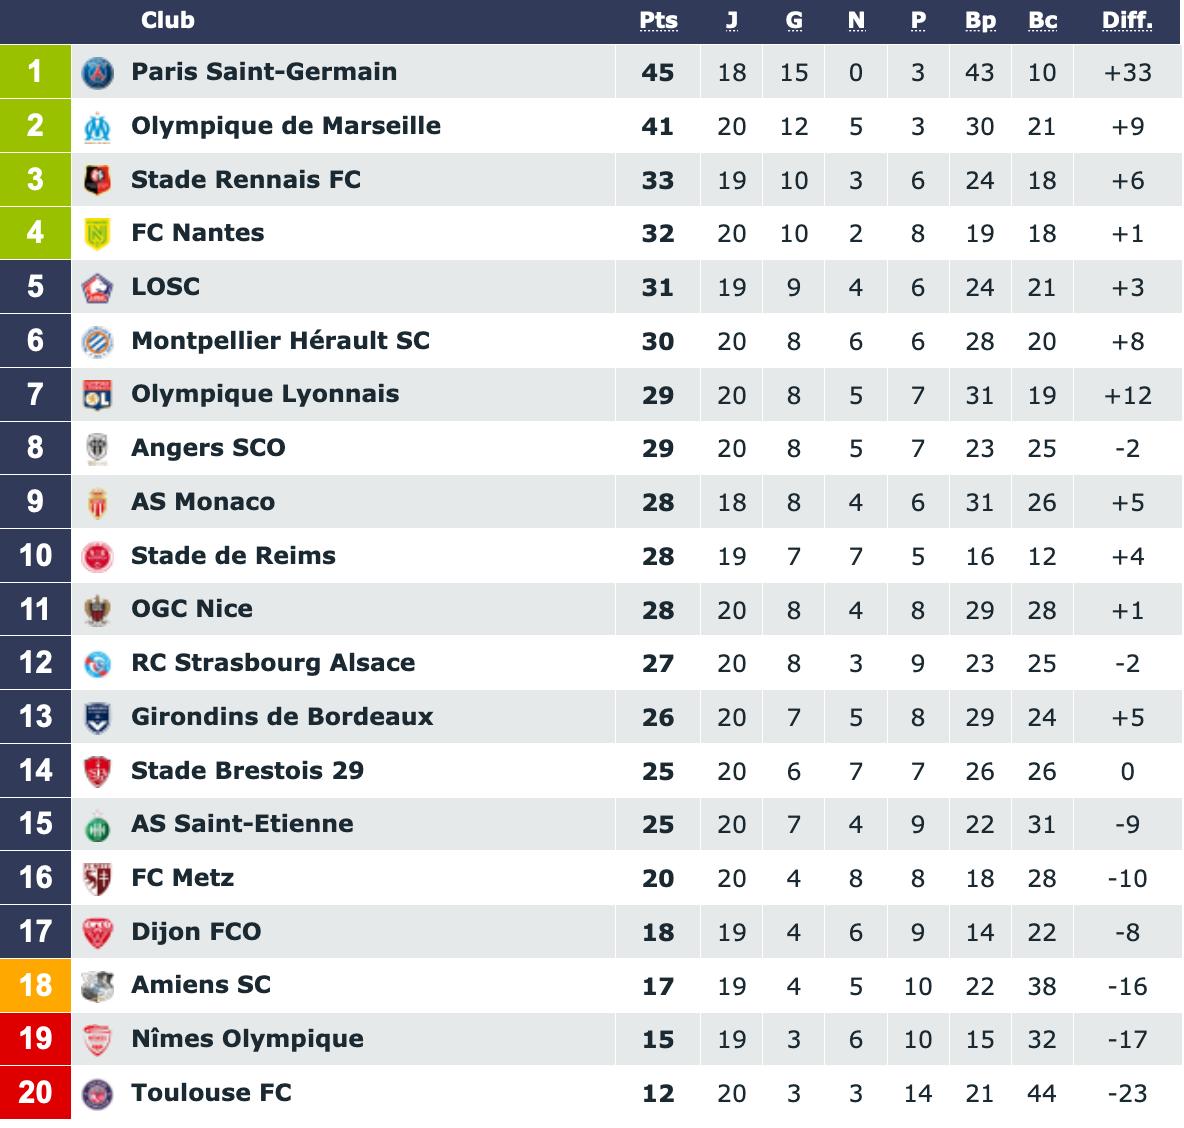 Screenshot_2020-01-12 Classement Ligue 1 Conforama saison 2019 2020.png (205 KB)